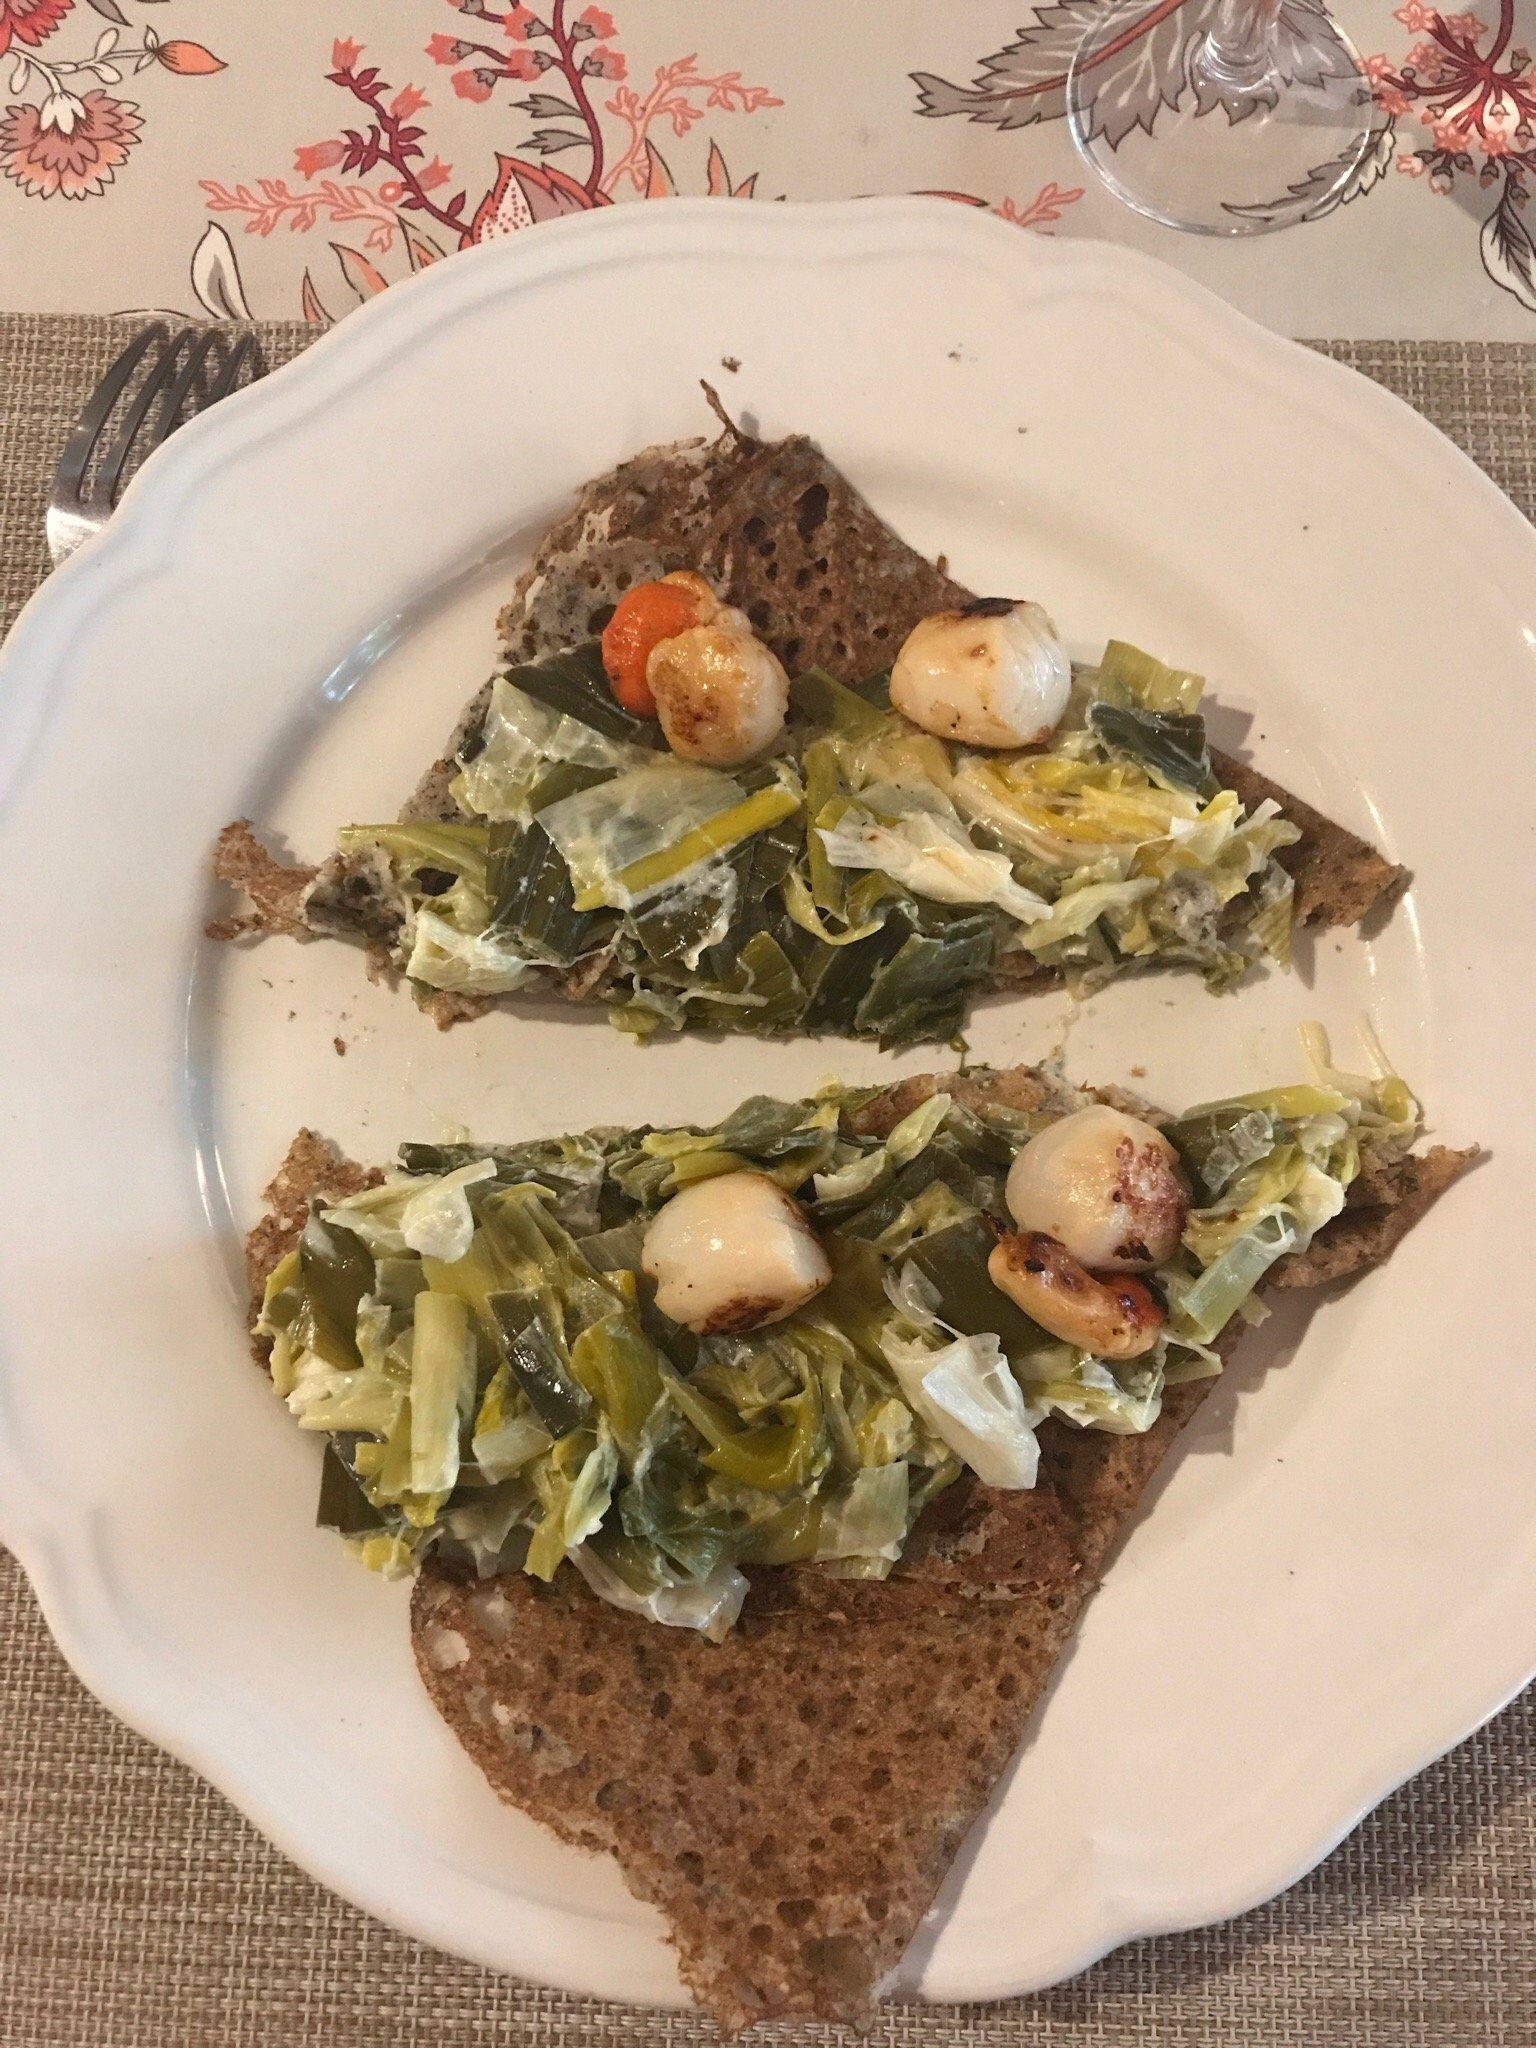 Creperie Fleur De Sel Montsoreau Bekijk 80 Onpartijdige Beoordelingen Van Creperie Fleur De Sel Gewaardeerd Als 4 5 Van 5 Bij Tripadvisor En Als Nr Restaurant